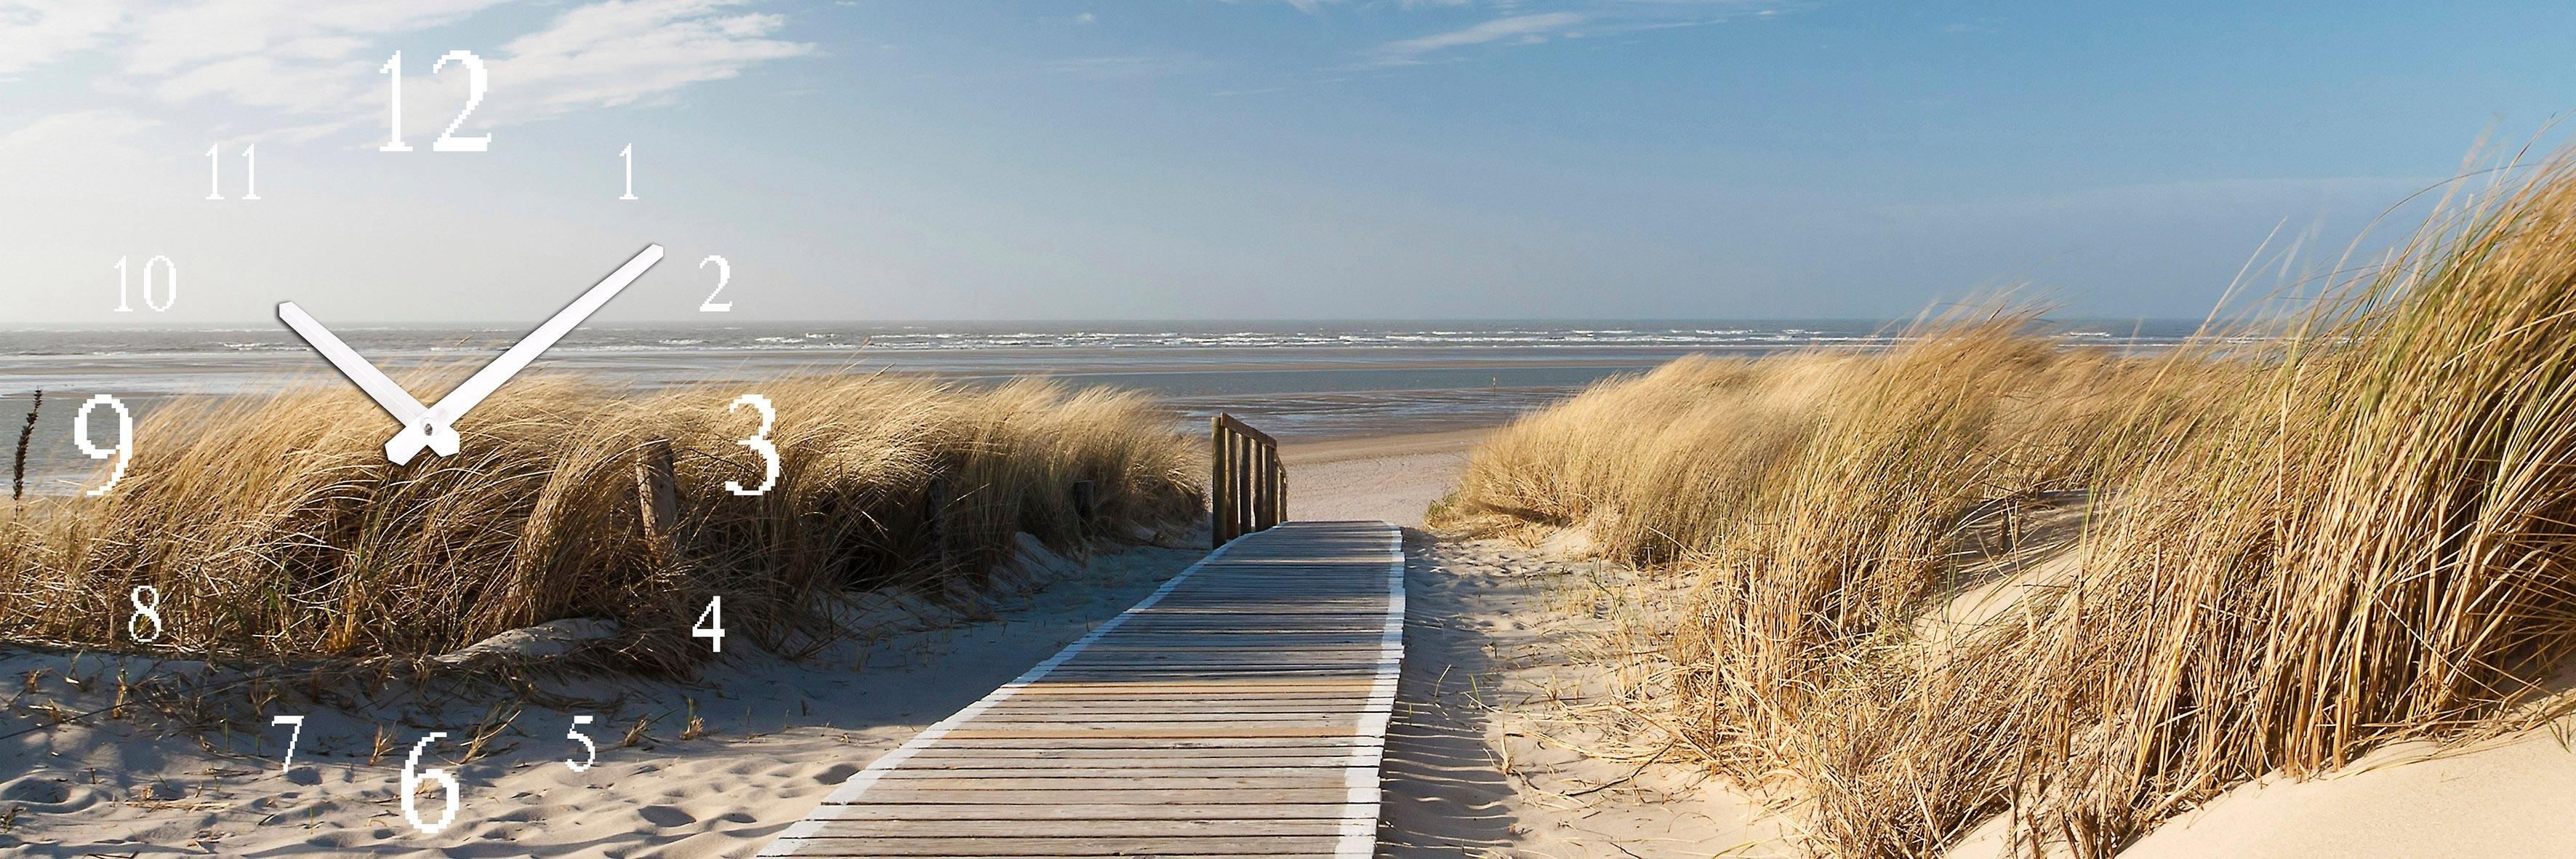 wandklok »Strandweg« veilig op otto.nl kopen